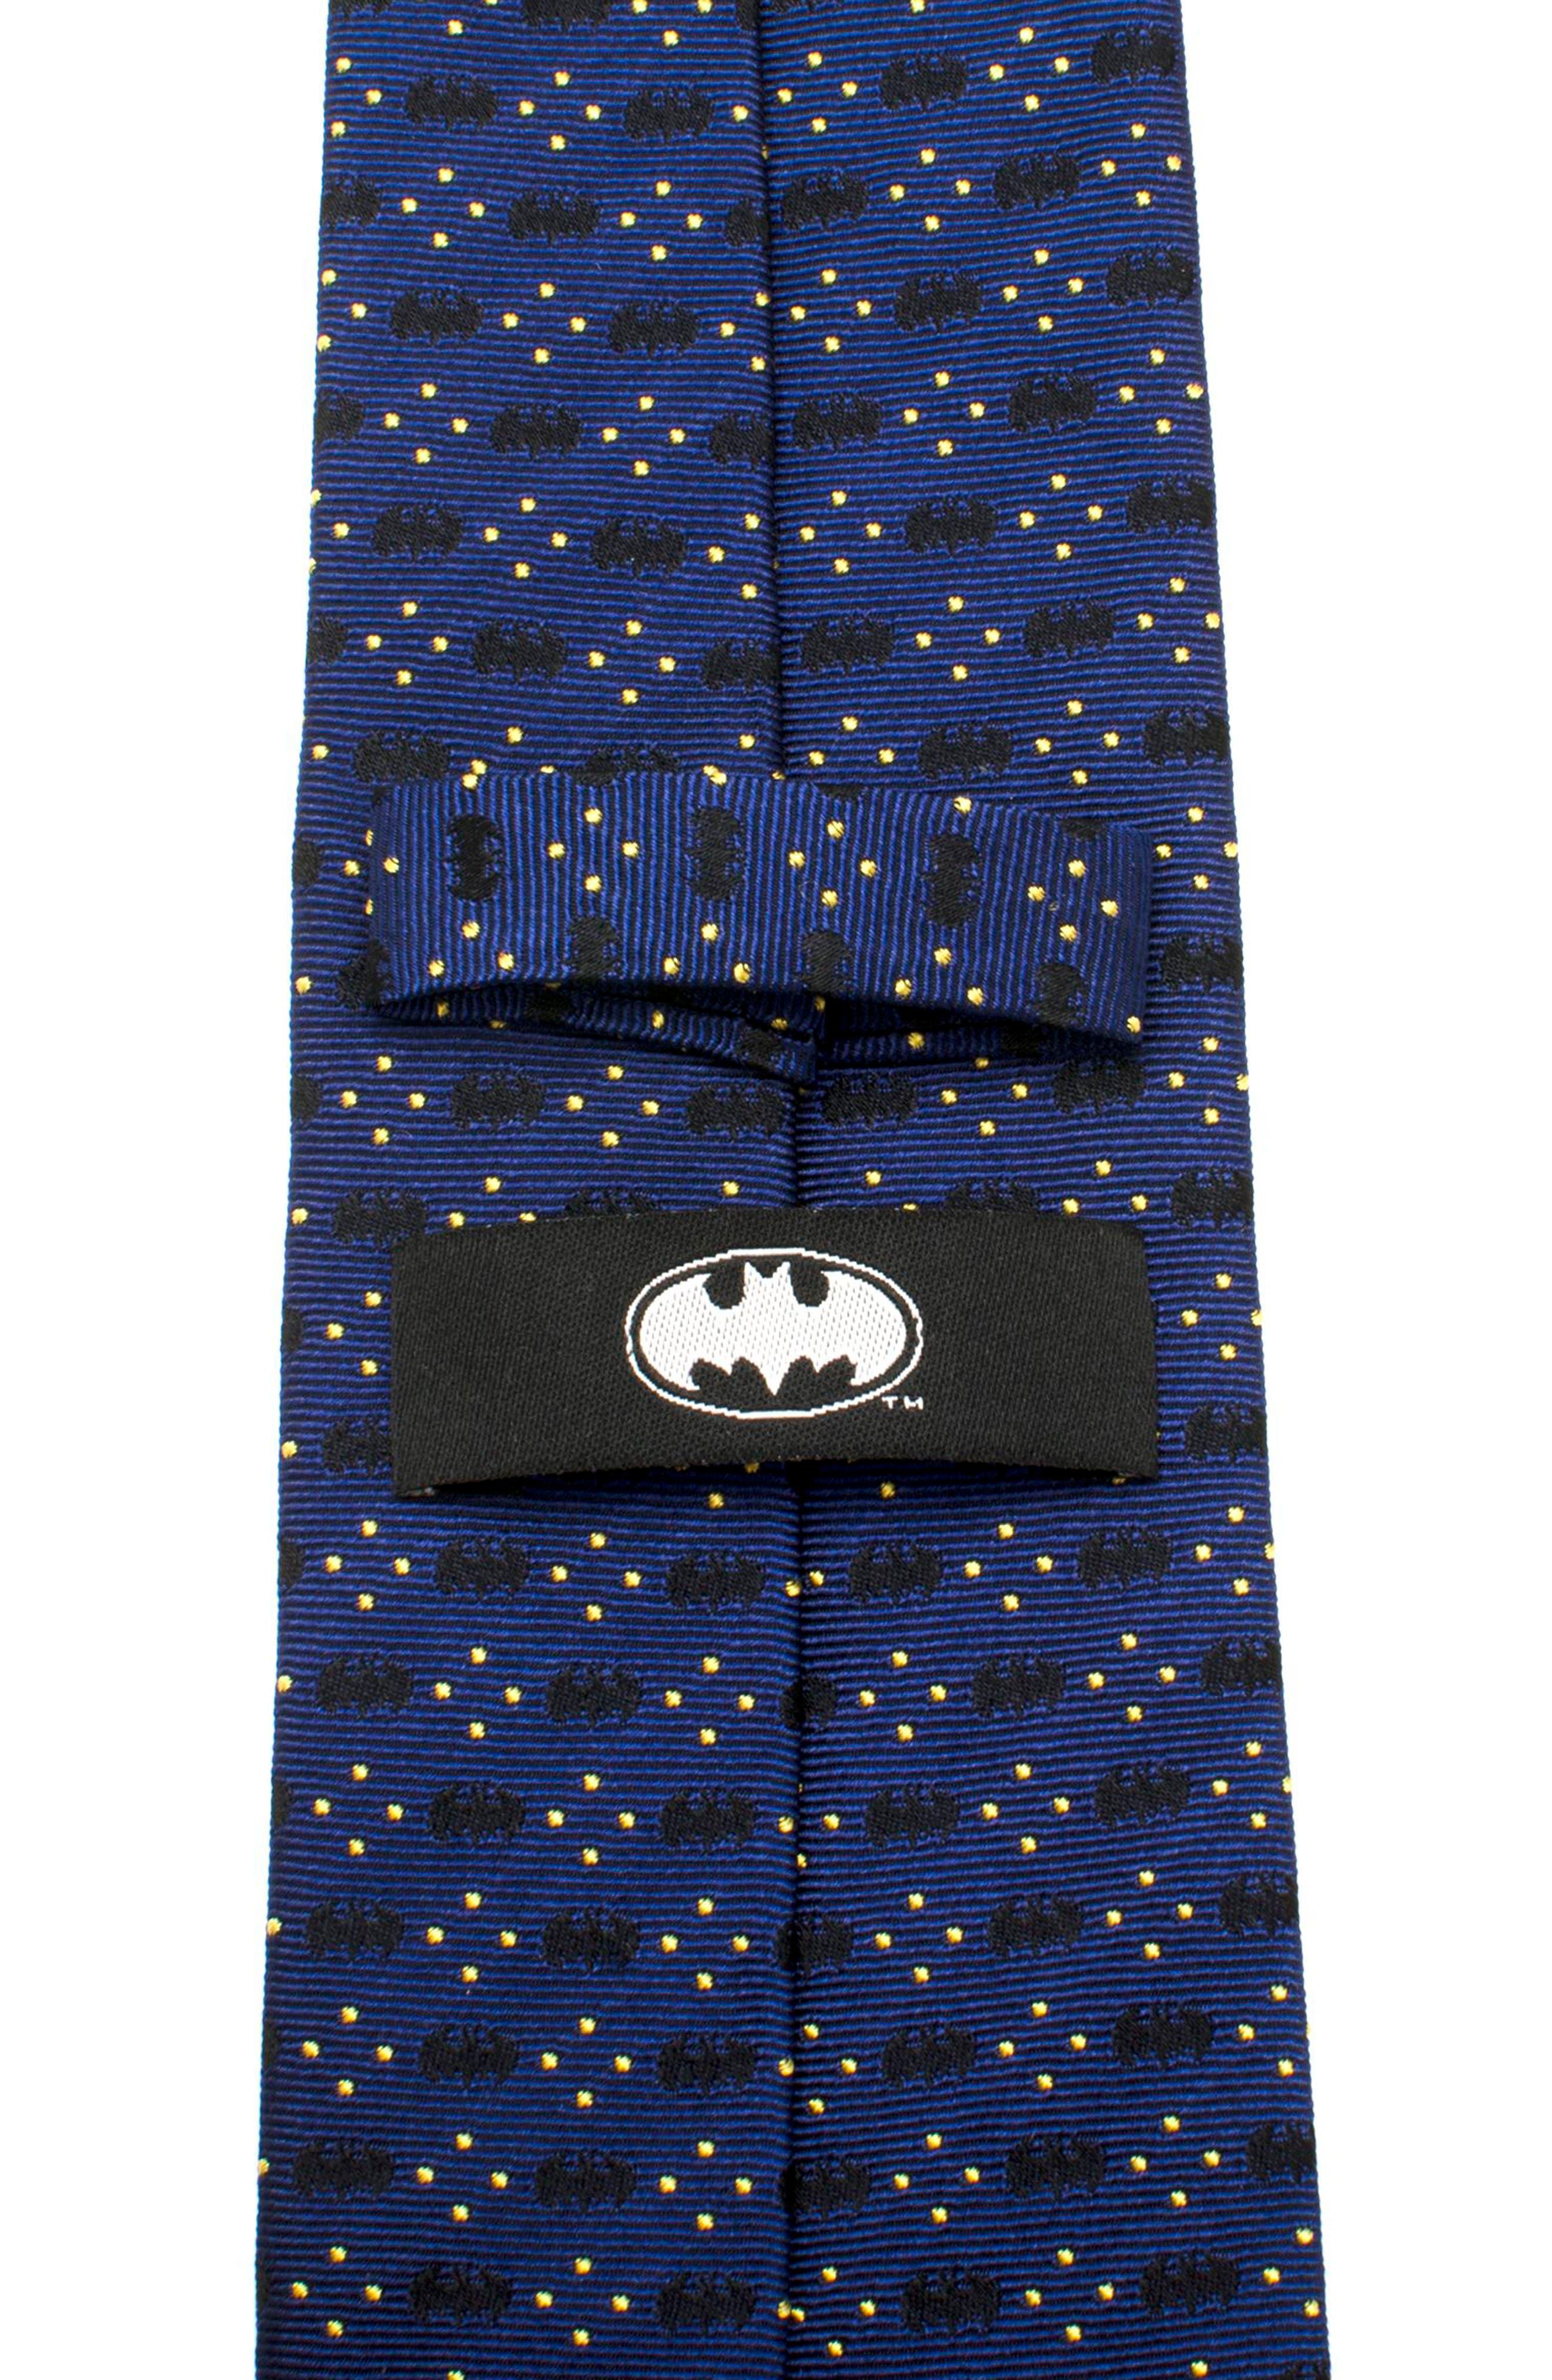 Batman Diamond Dot Silk Tie,                             Alternate thumbnail 3, color,                             Navy